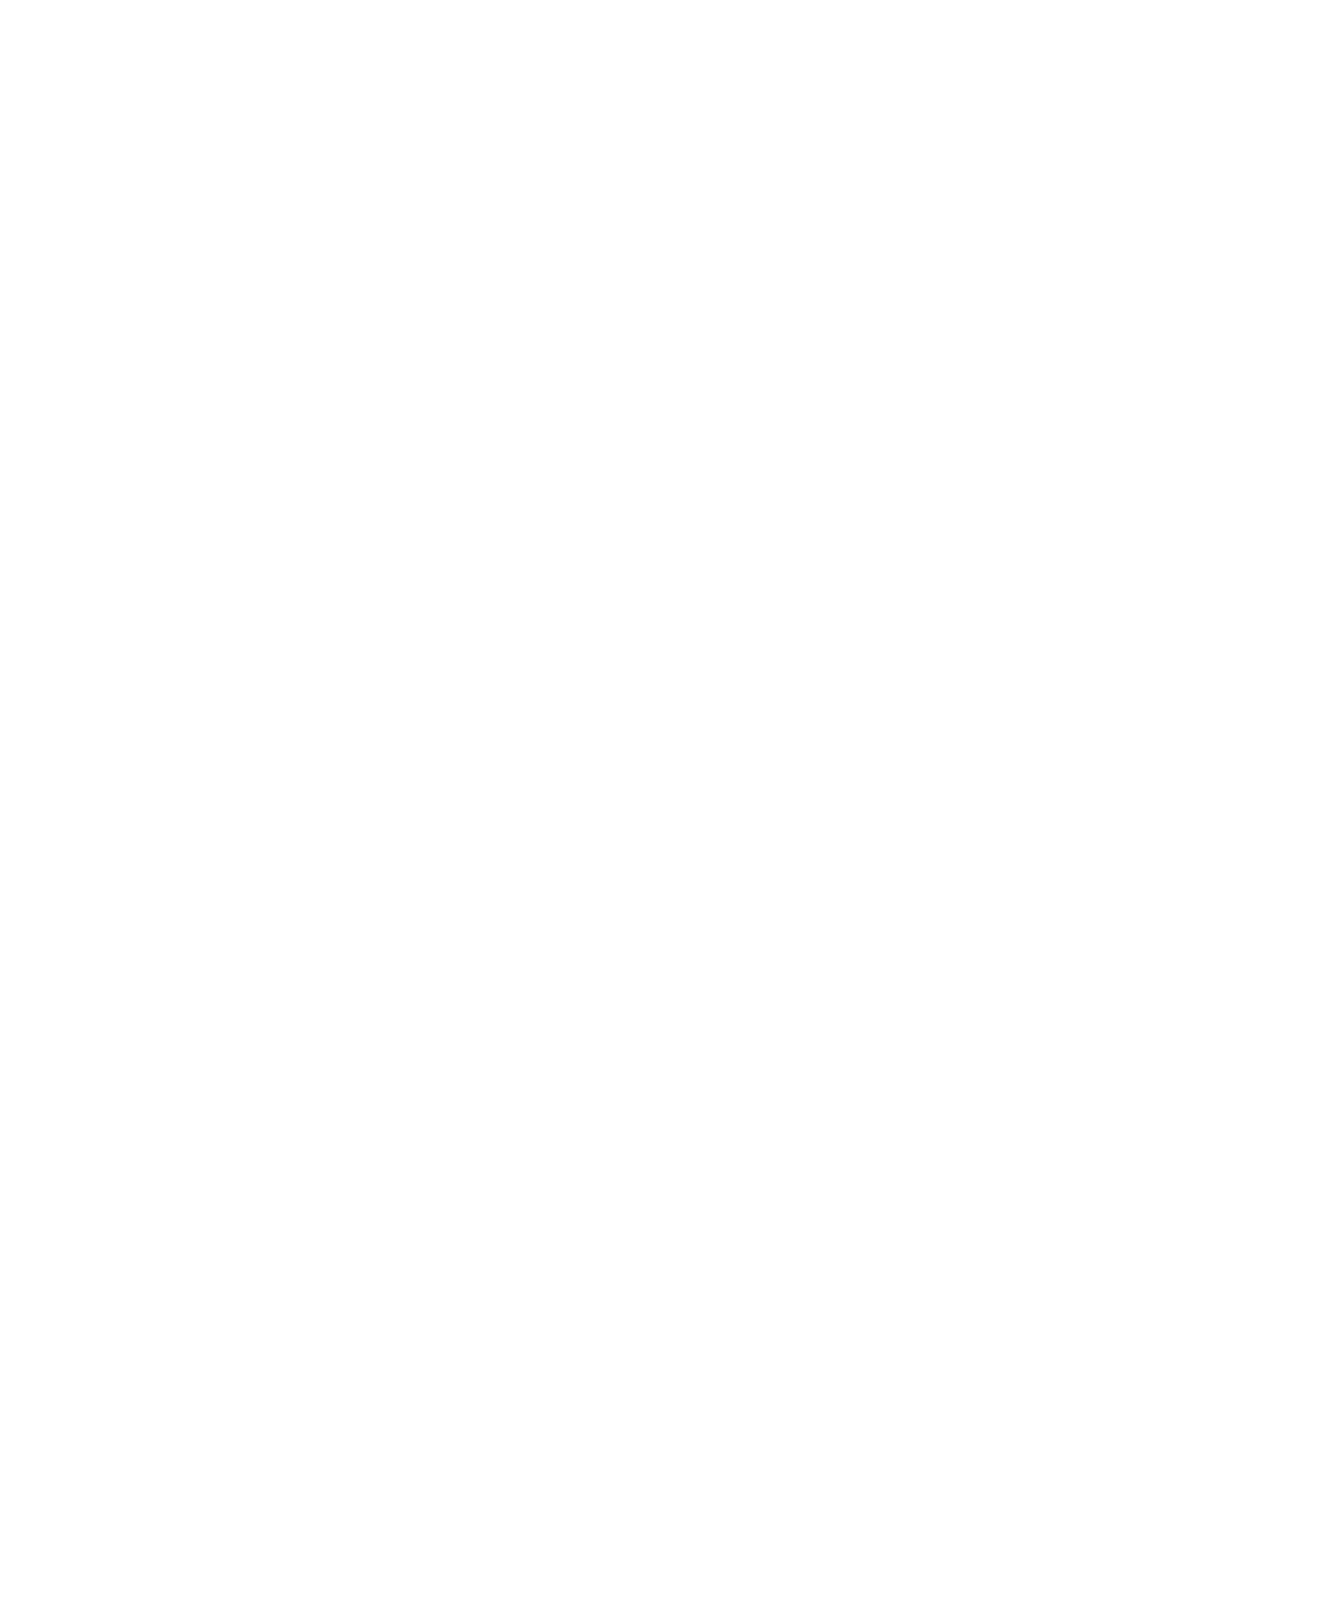 Logo documents